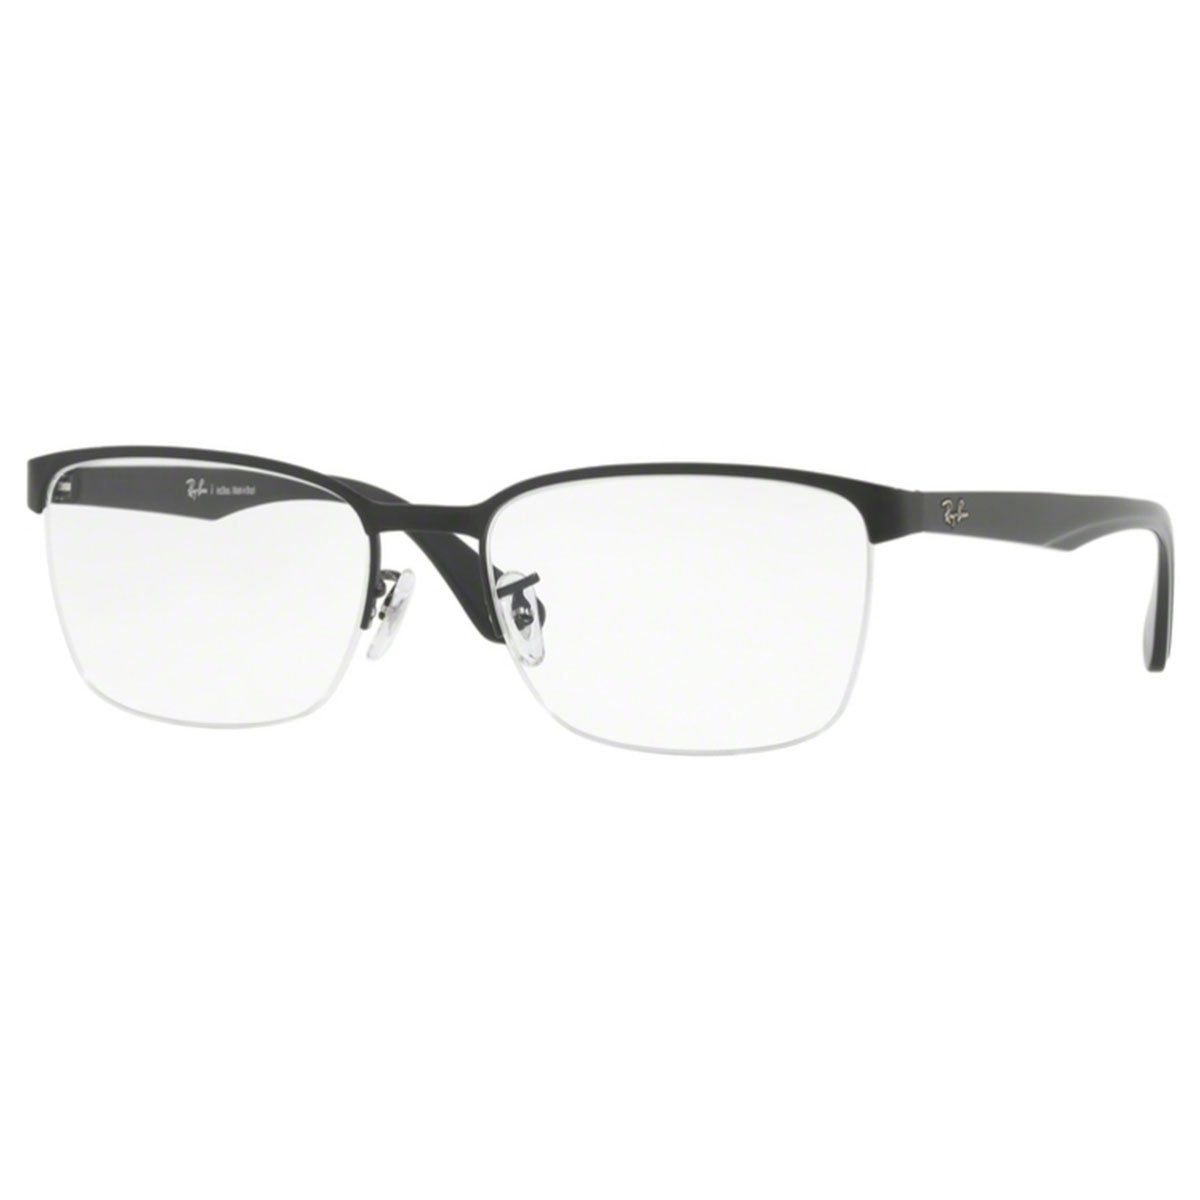 828be9ed58c1e Oculos De Grau Ray Ban Masculino Original   David Simchi-Levi